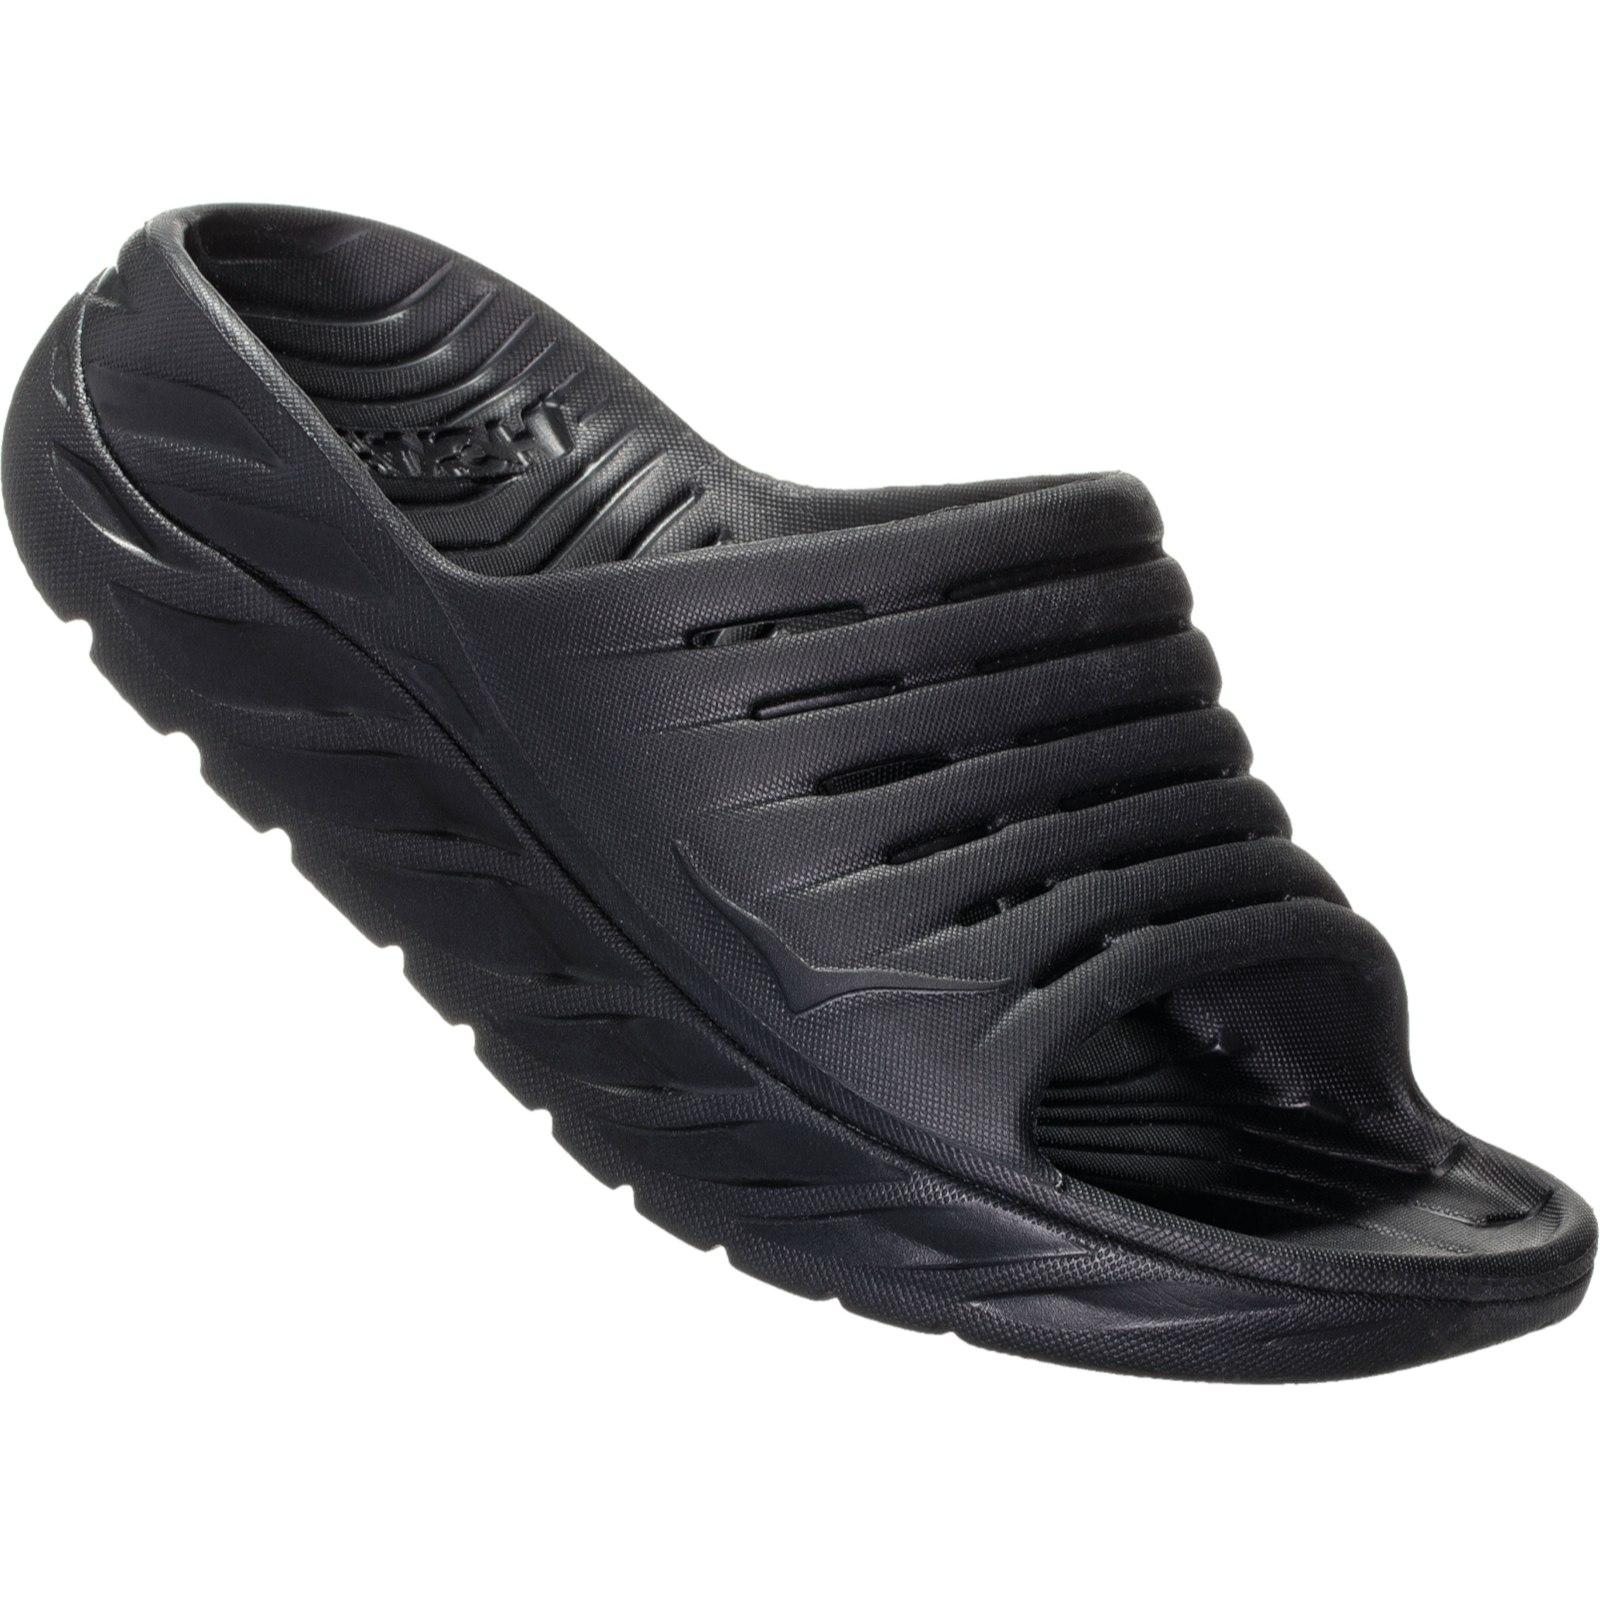 Hoka One One Ora Recovery Slide 2 Women's Sandals - black / black